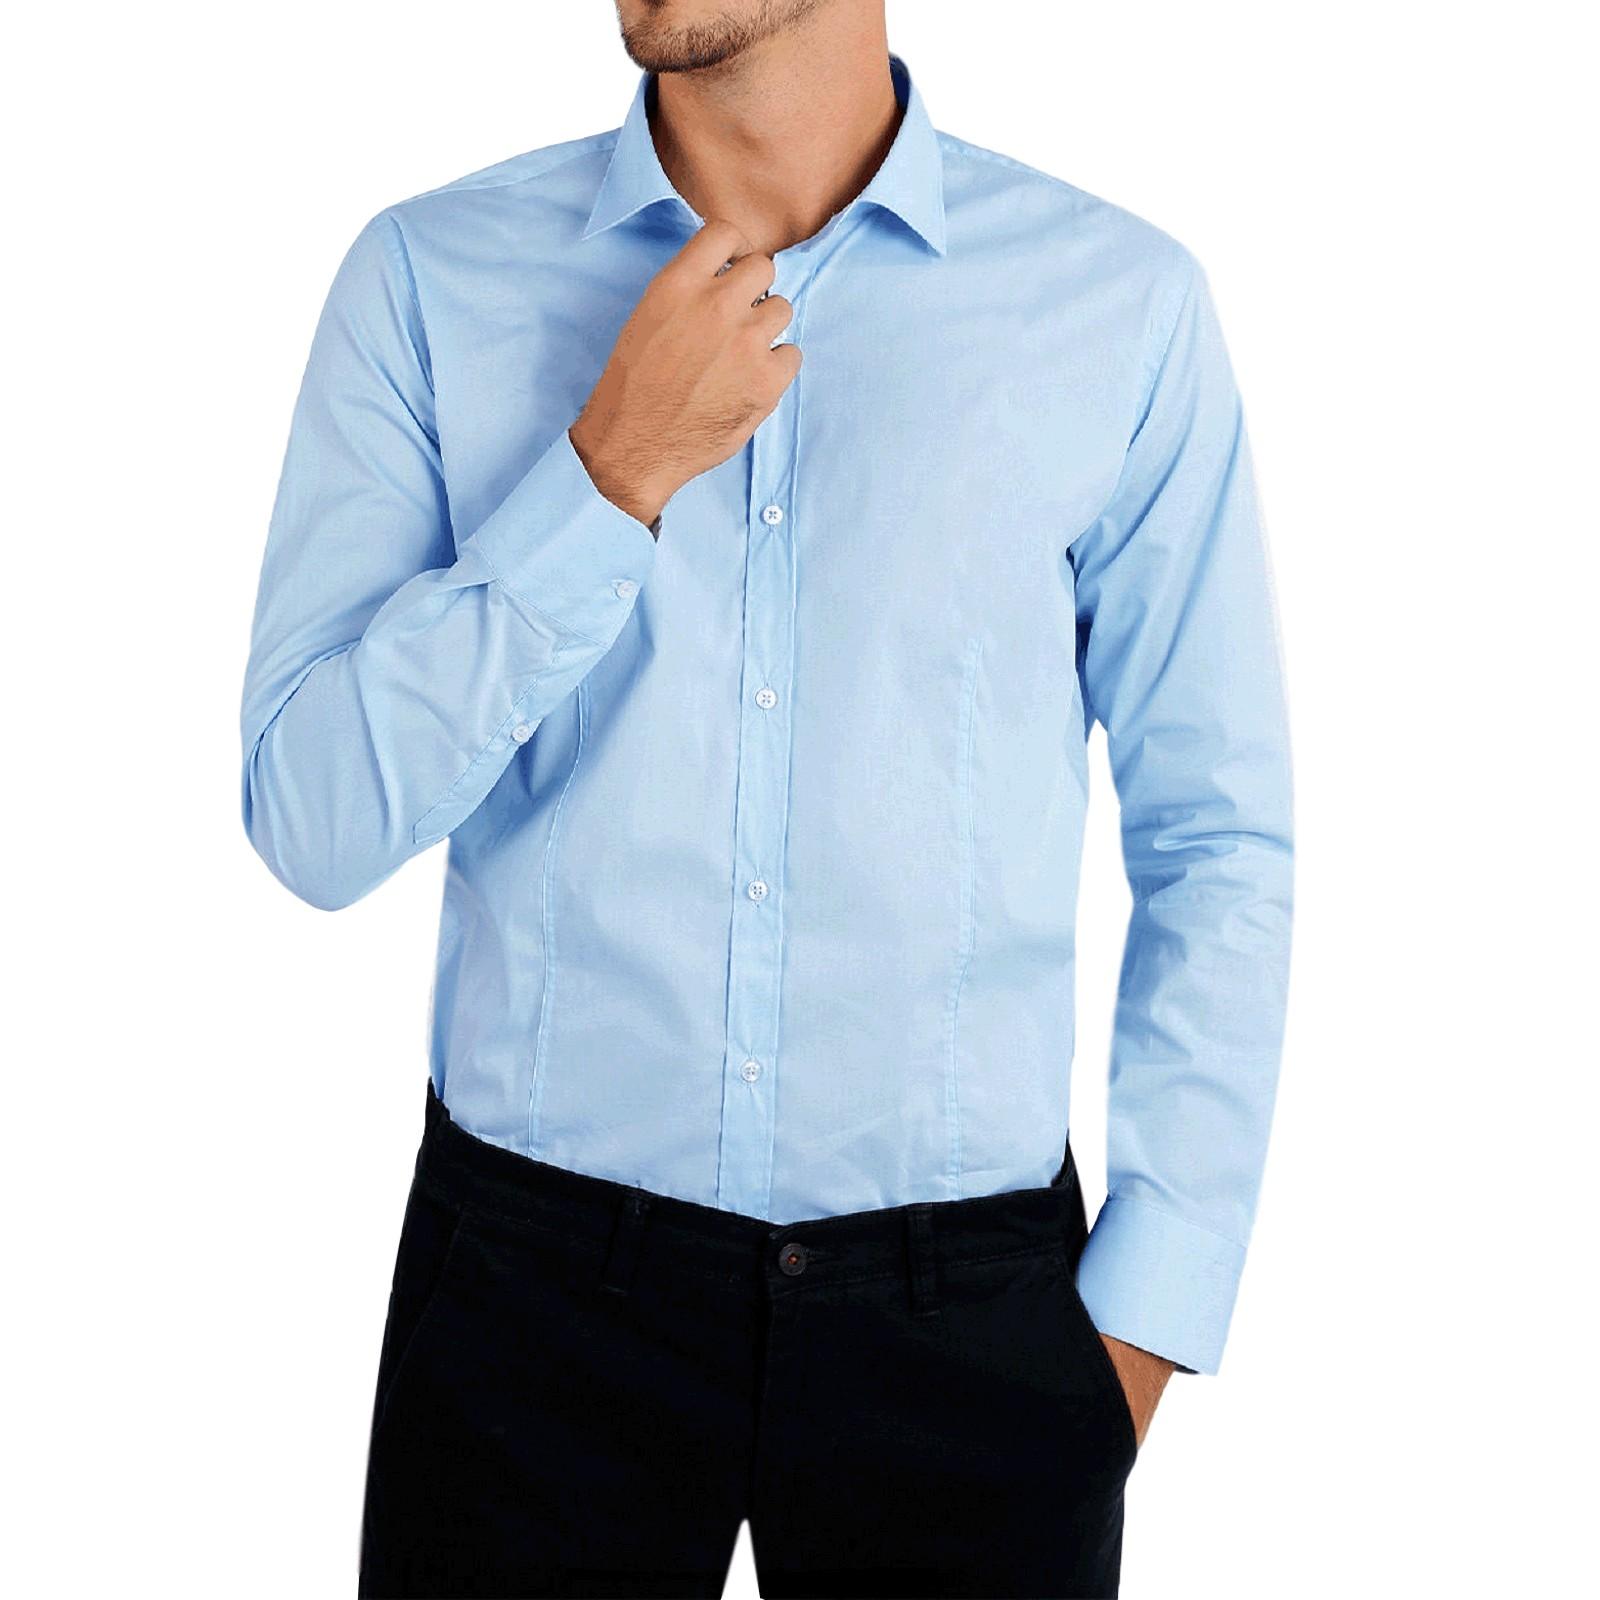 Camicia-Uomo-Celeste-Bianca-Slim-Fit-Manica-Lunga-Sartoriale-Cotone-TG-S-7XL miniatura 24